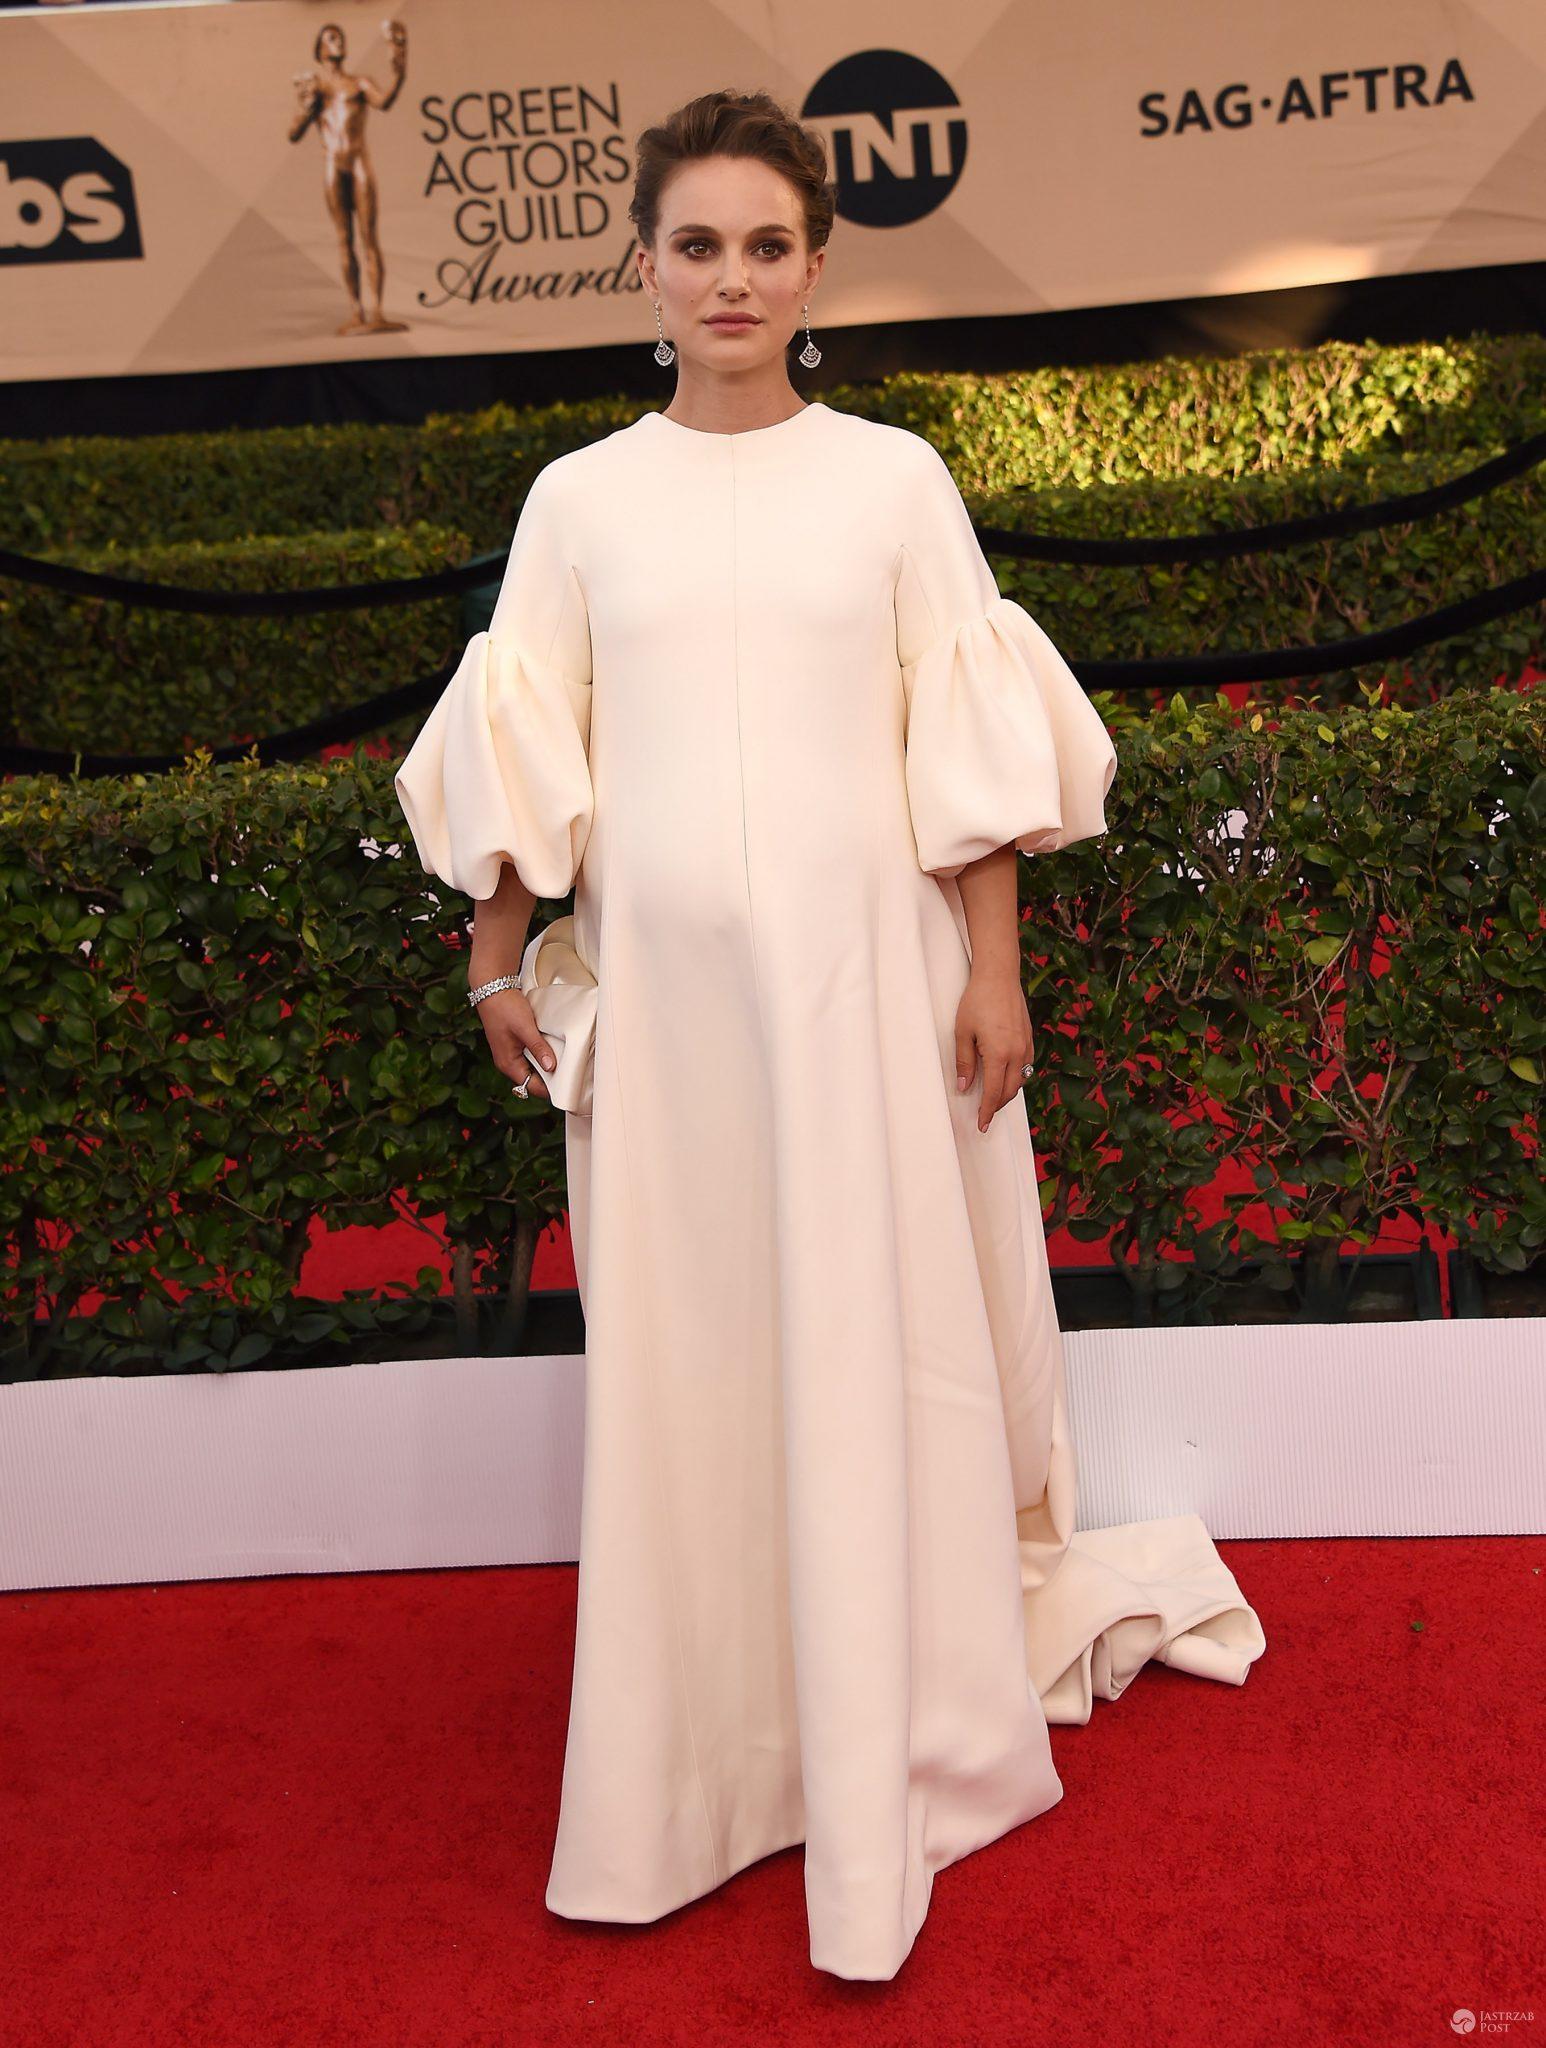 Natalie Portman w kreacji marki Dior - SAG Awards 2017